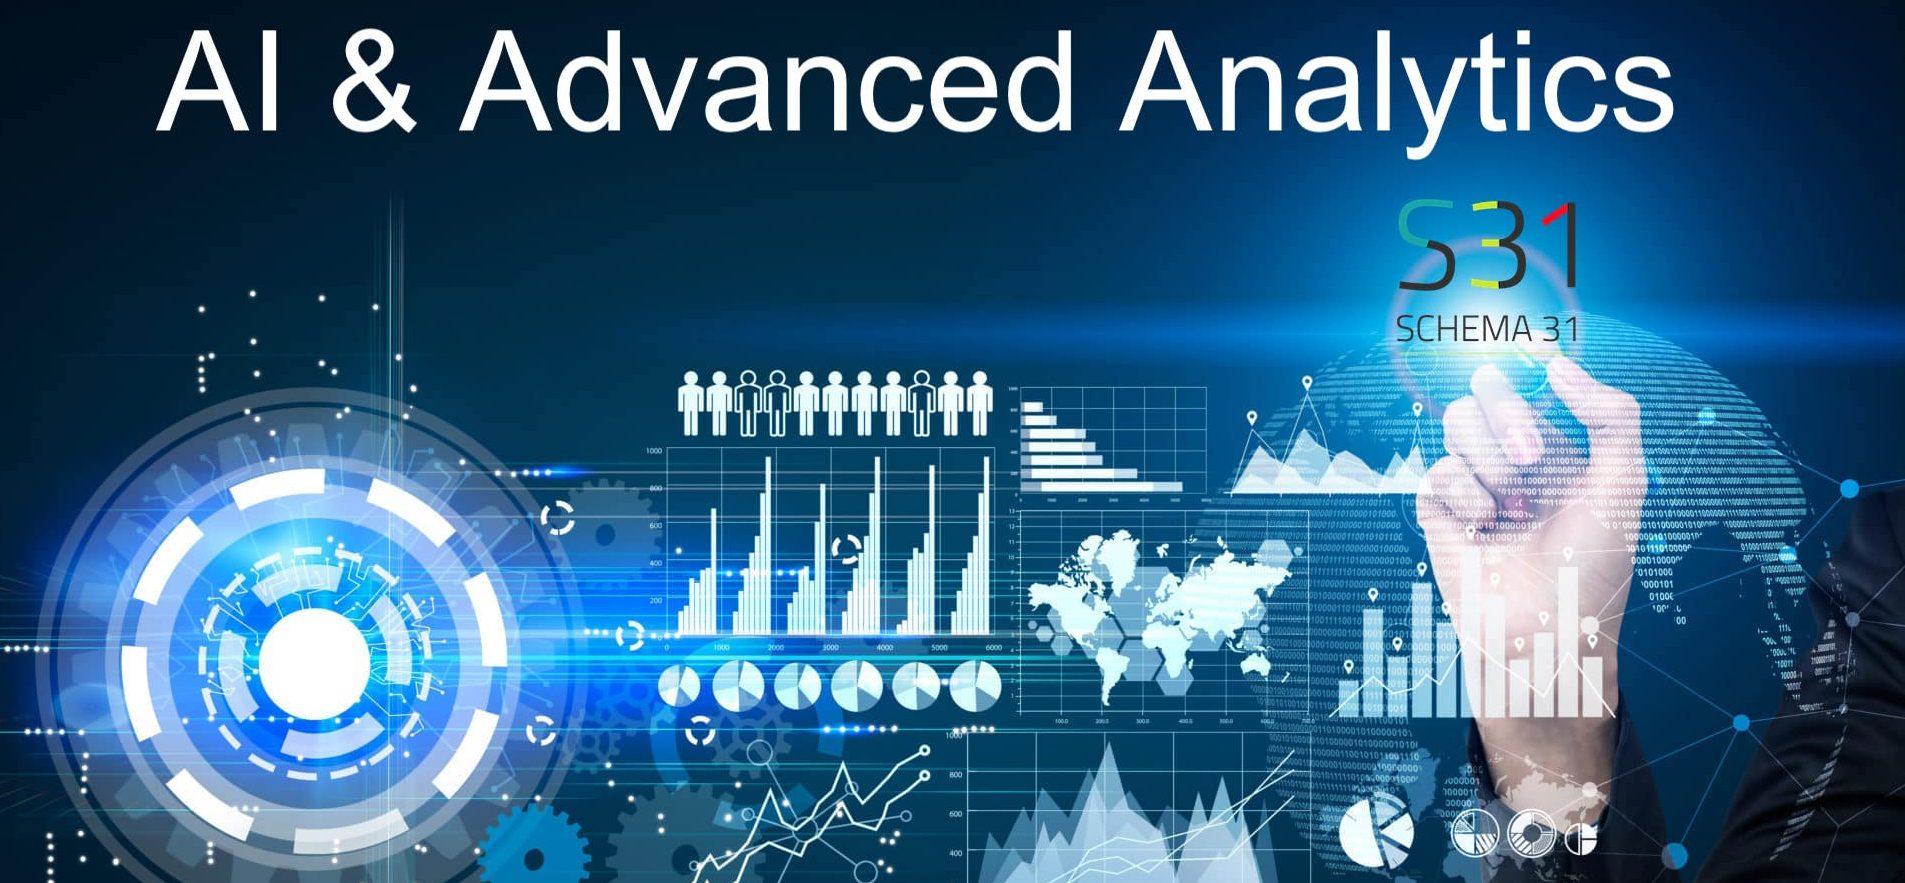 AI & Advanced Analytics